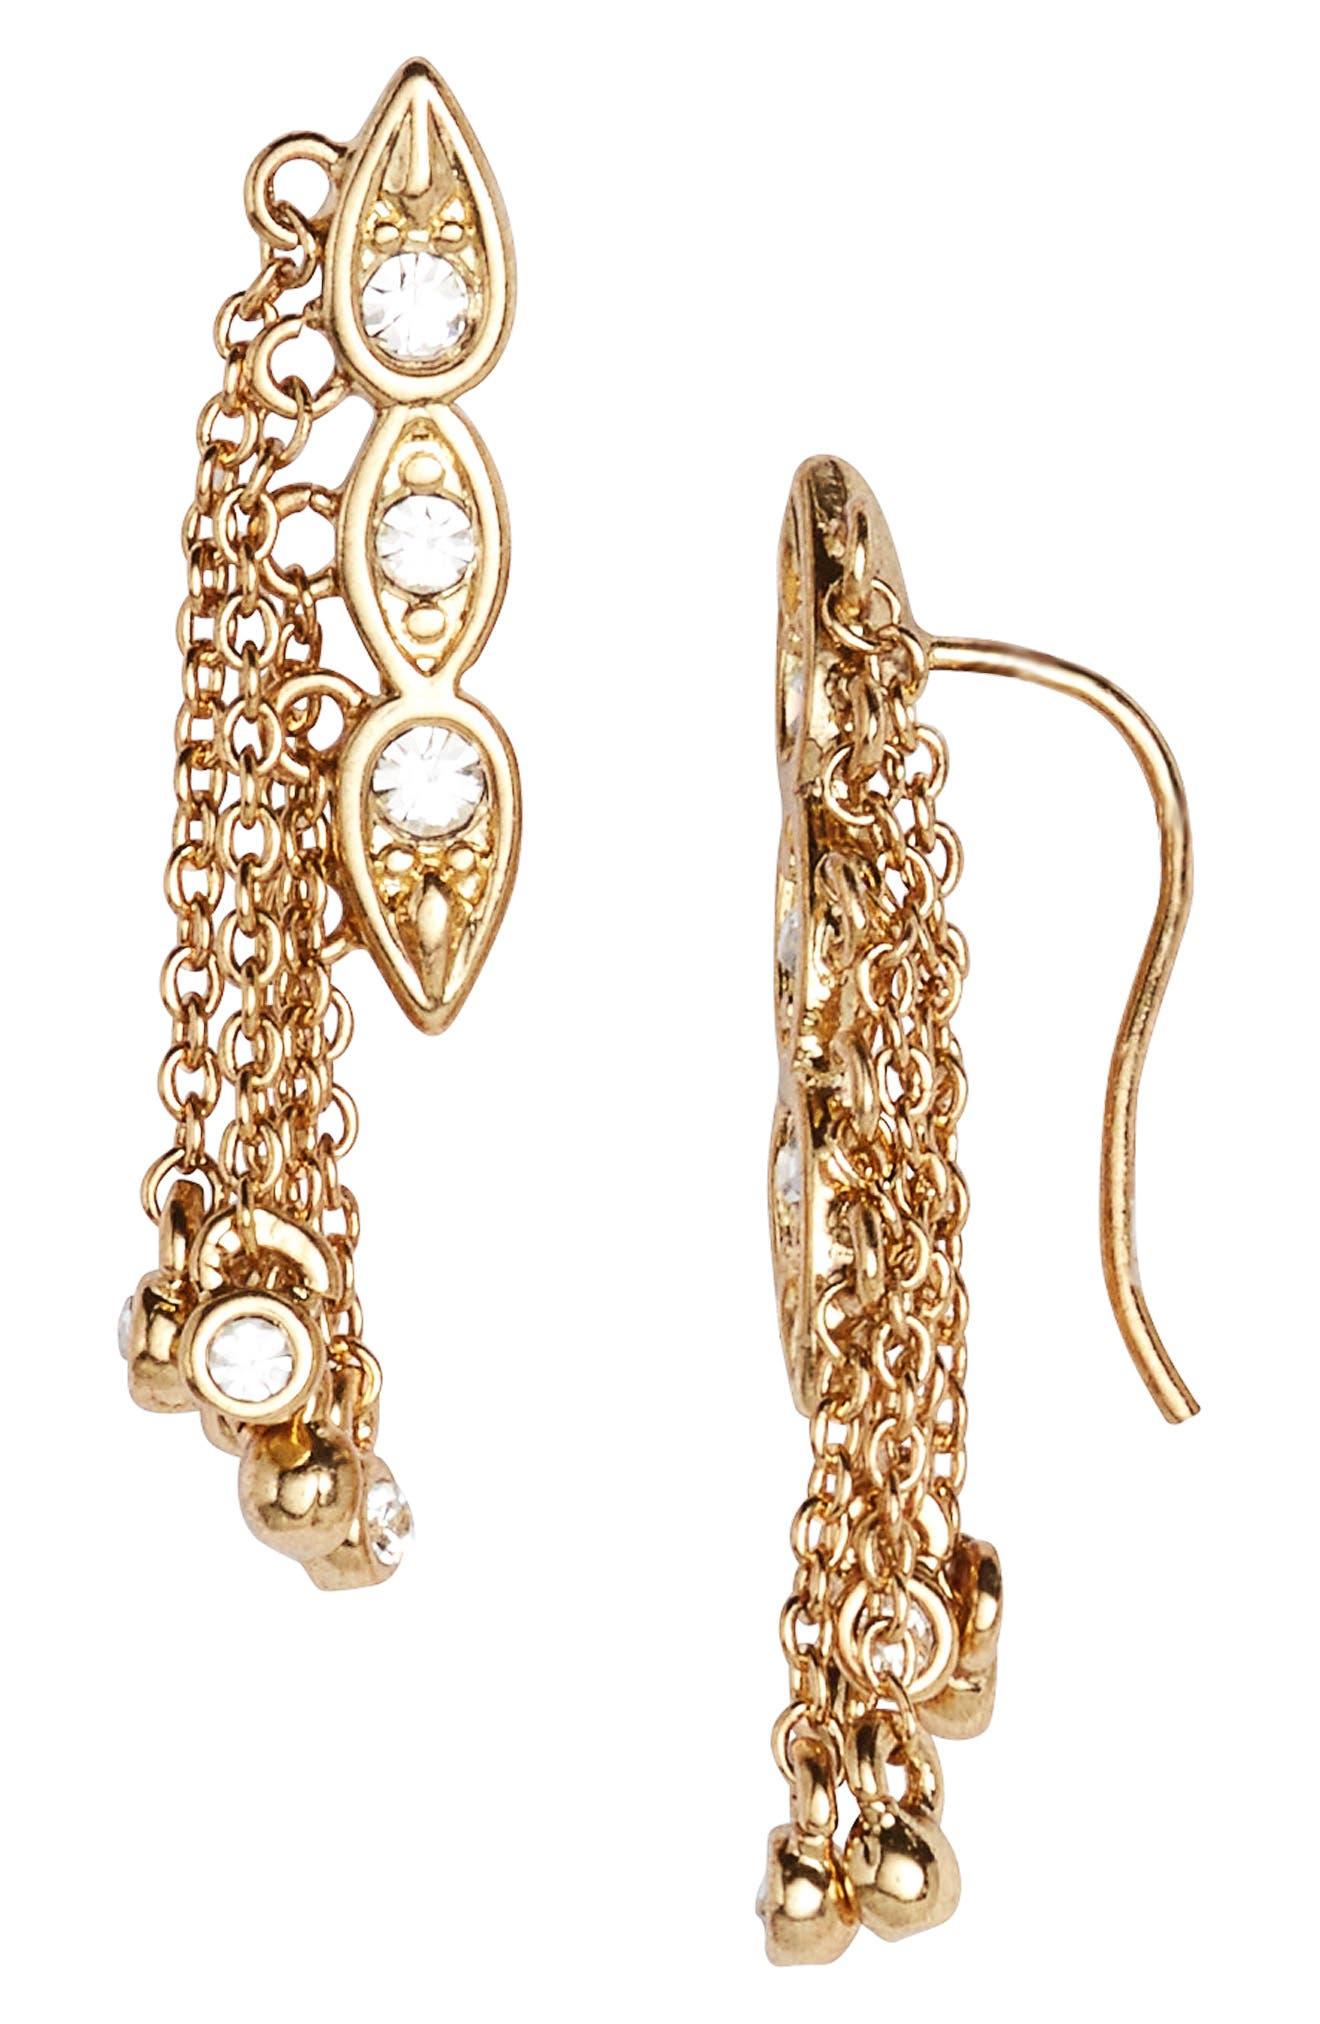 Poise Dangle Crawler Earrings,                         Main,                         color, Gold